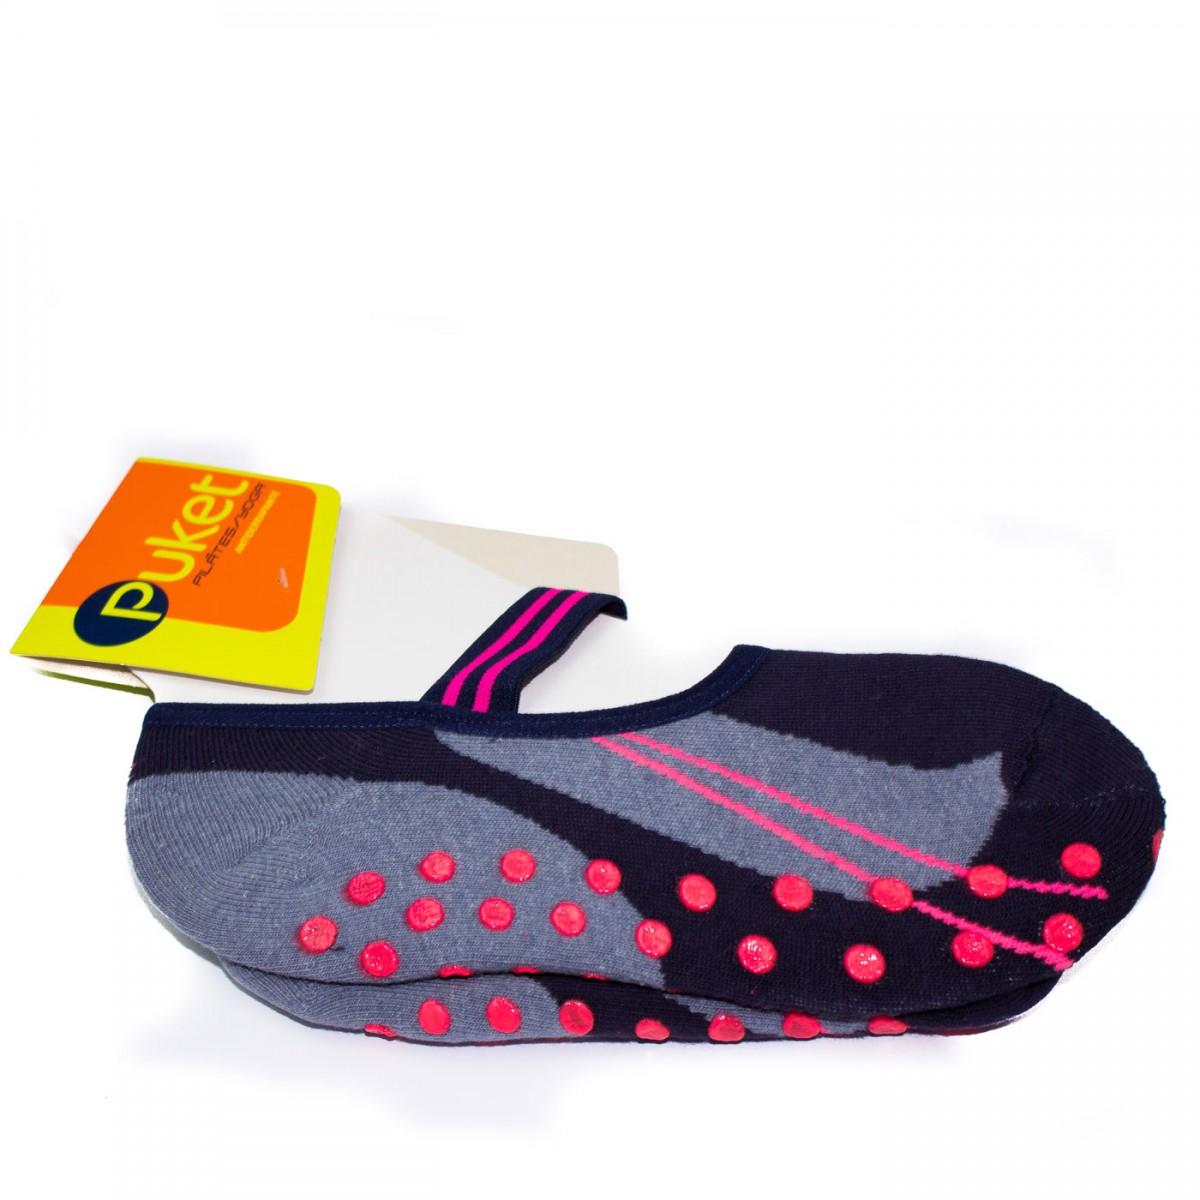 1ee17181c Bizz Store - Meia Para Pilates Puket Feminina Sapatilha